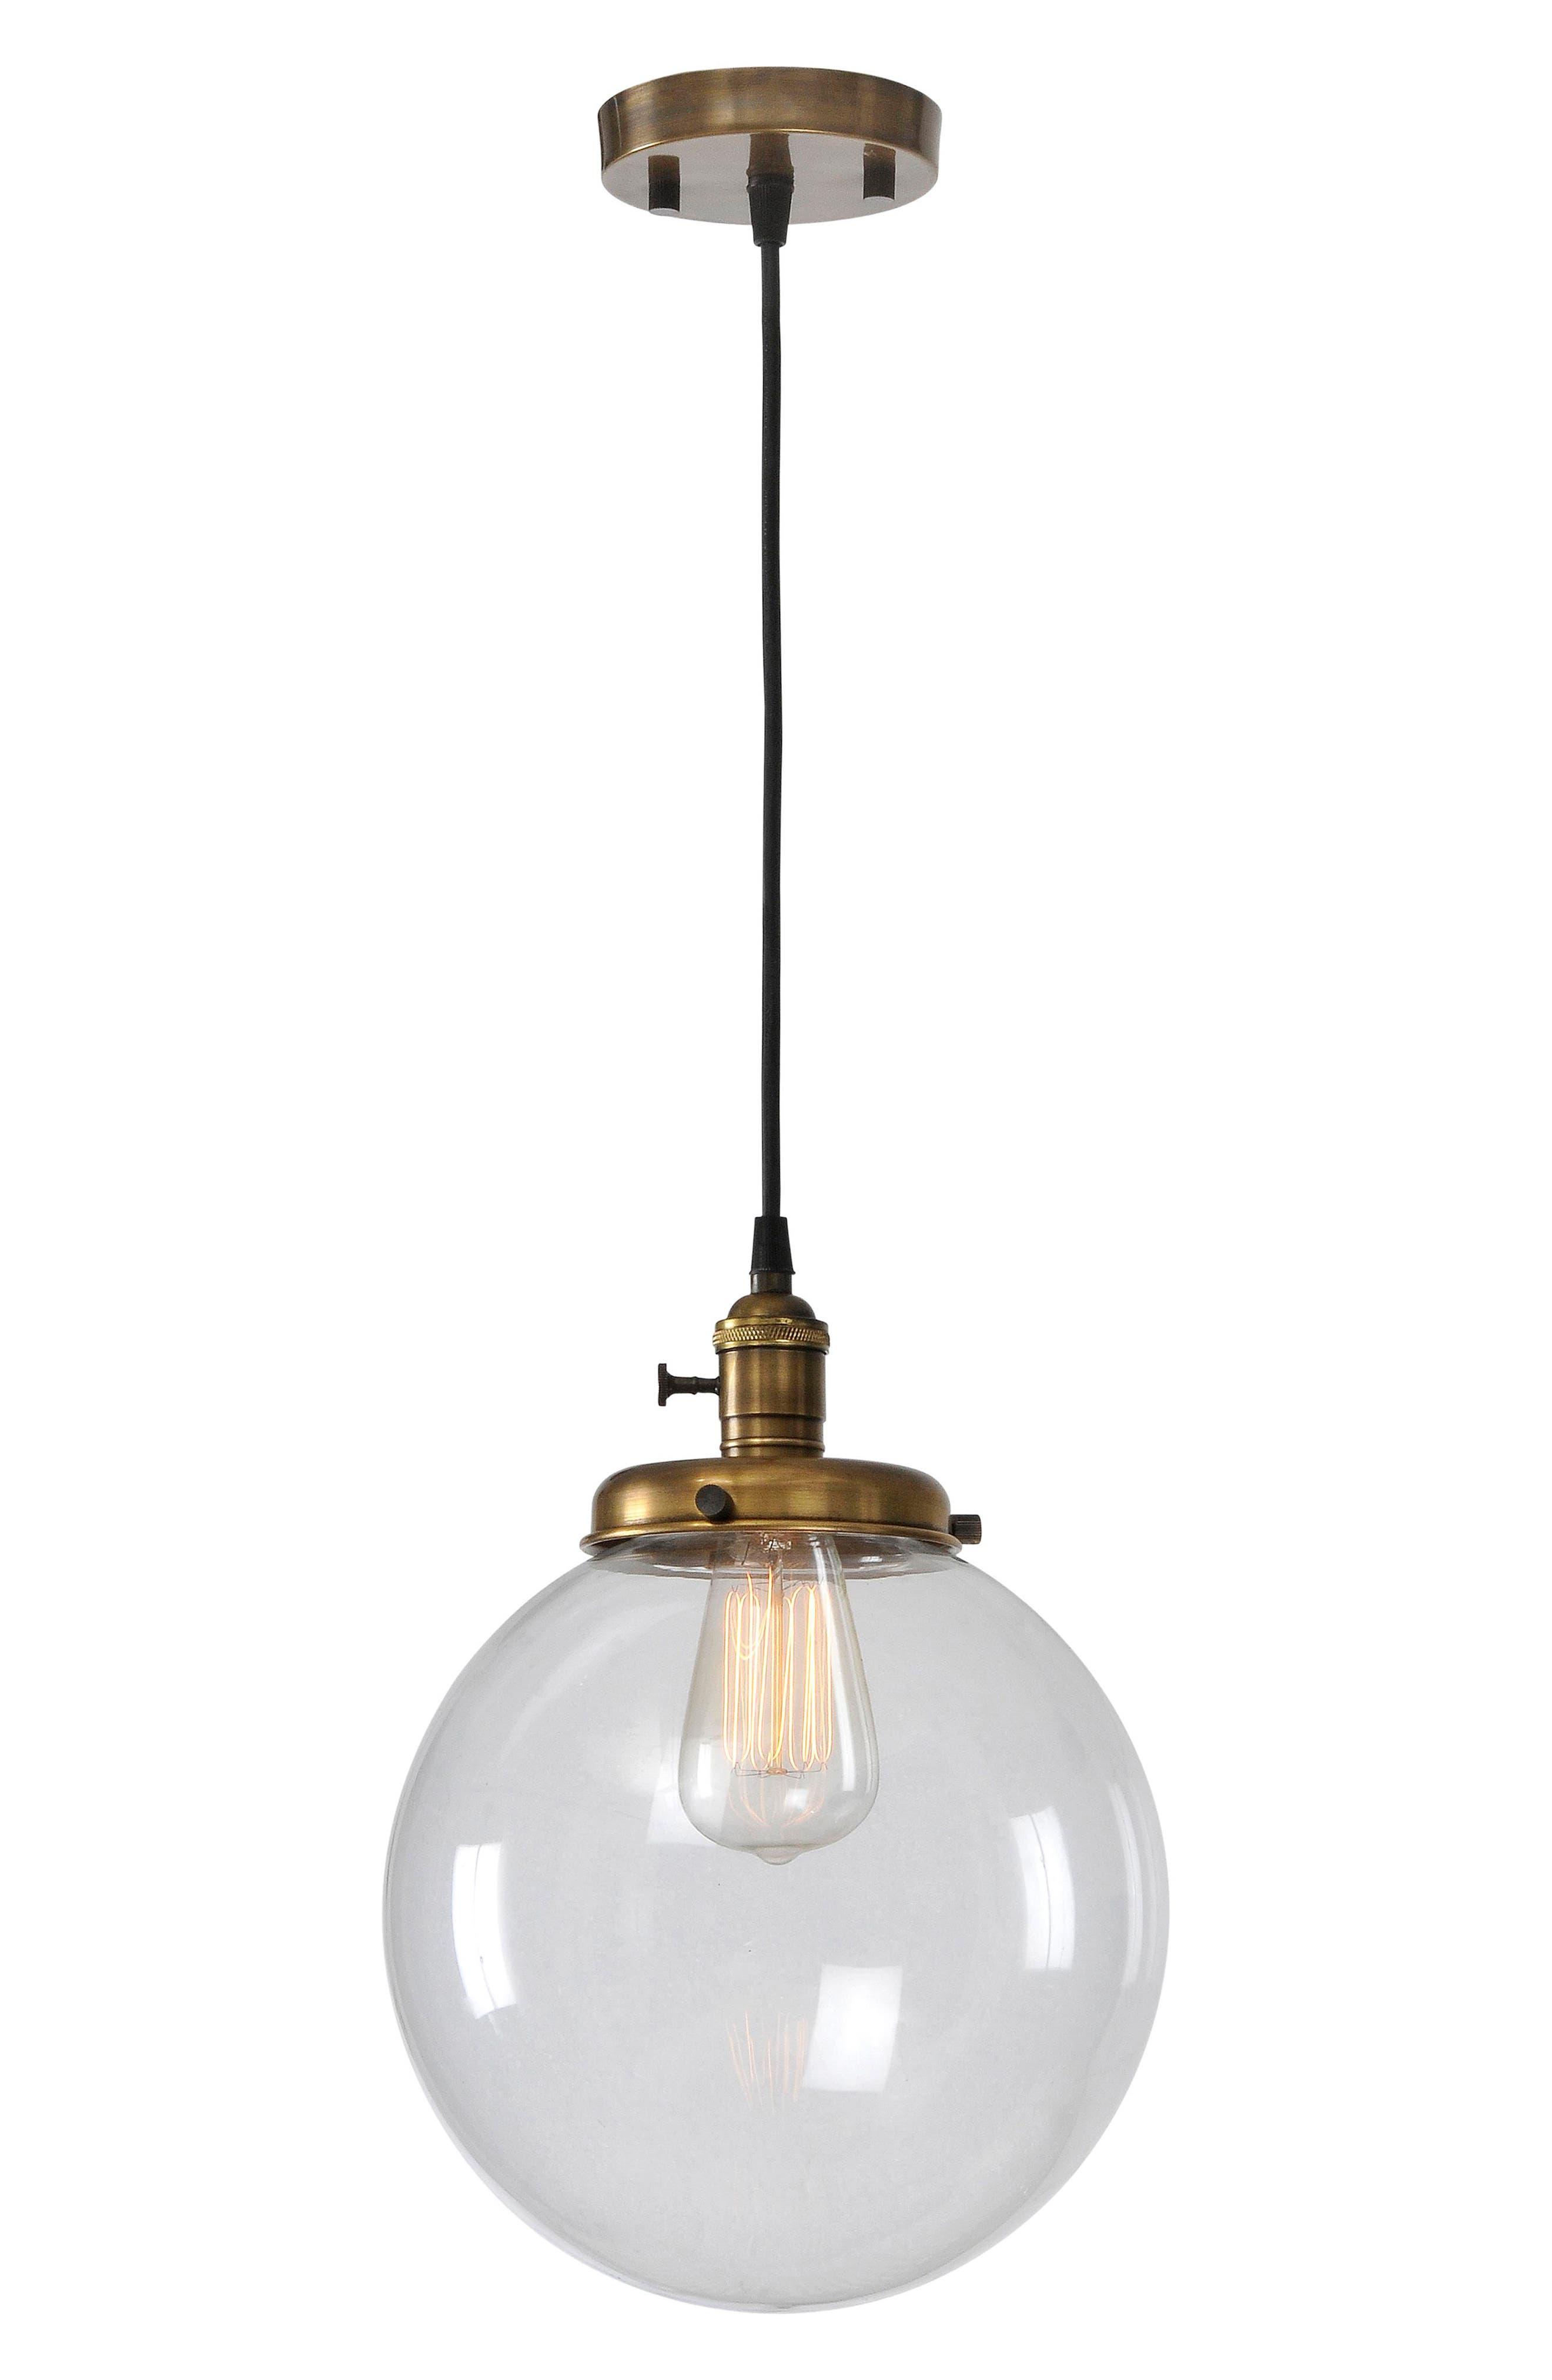 Alternate Image 1 Selected - Renwil Antonio Ceiling Light Fixture